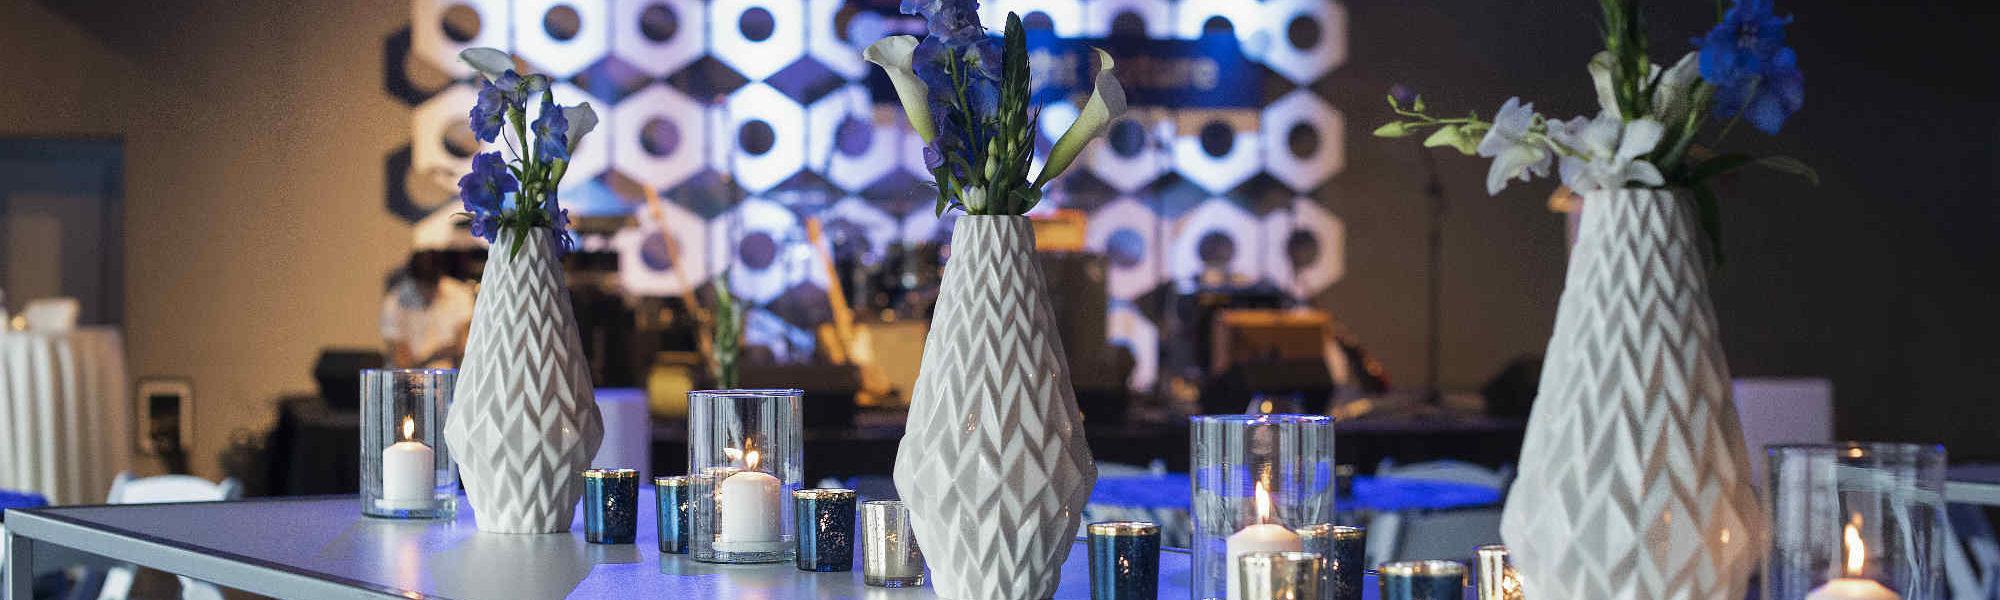 White vase centerpieces